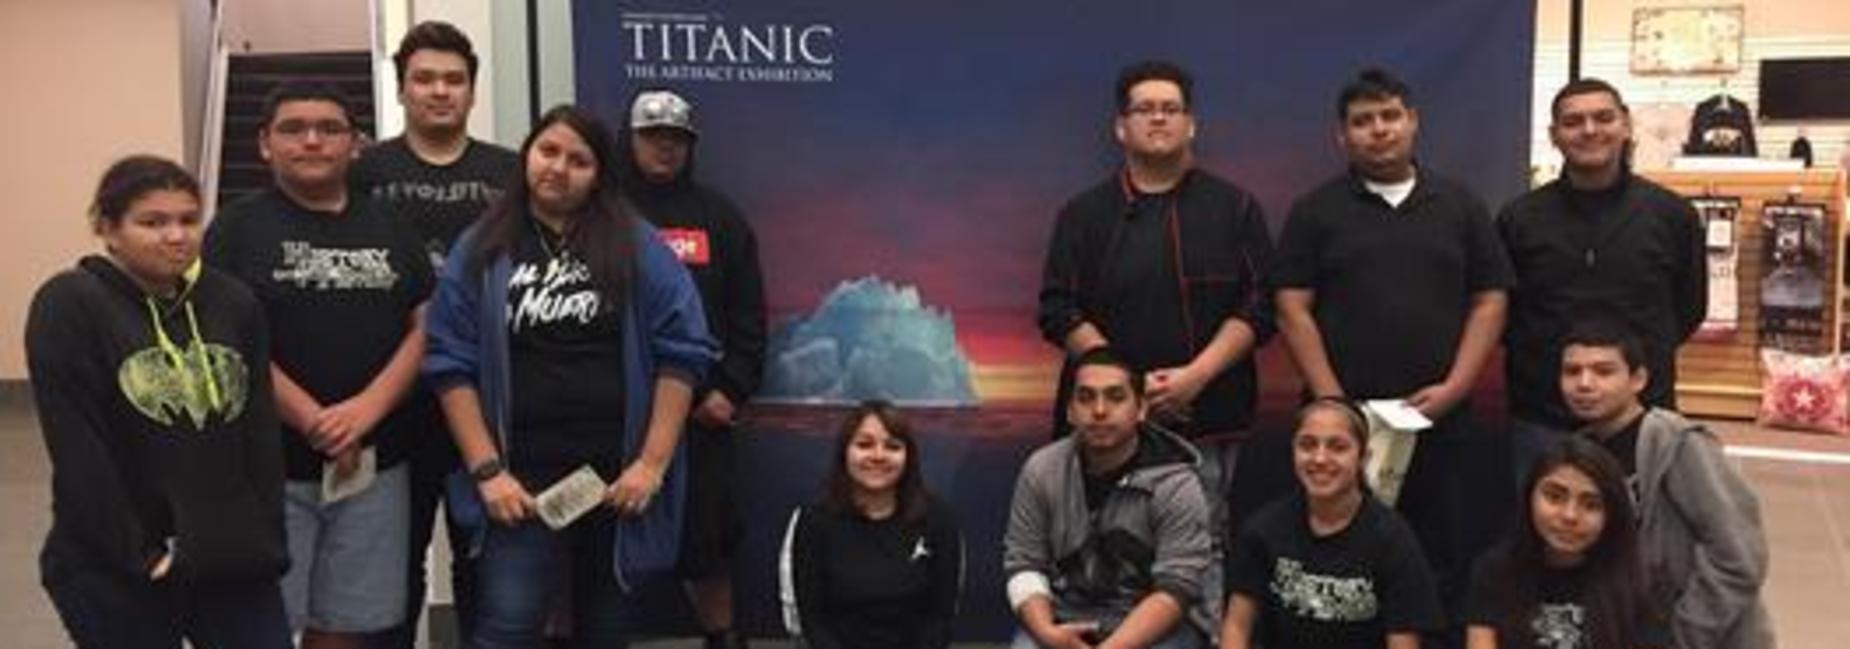 History Club - Titanic